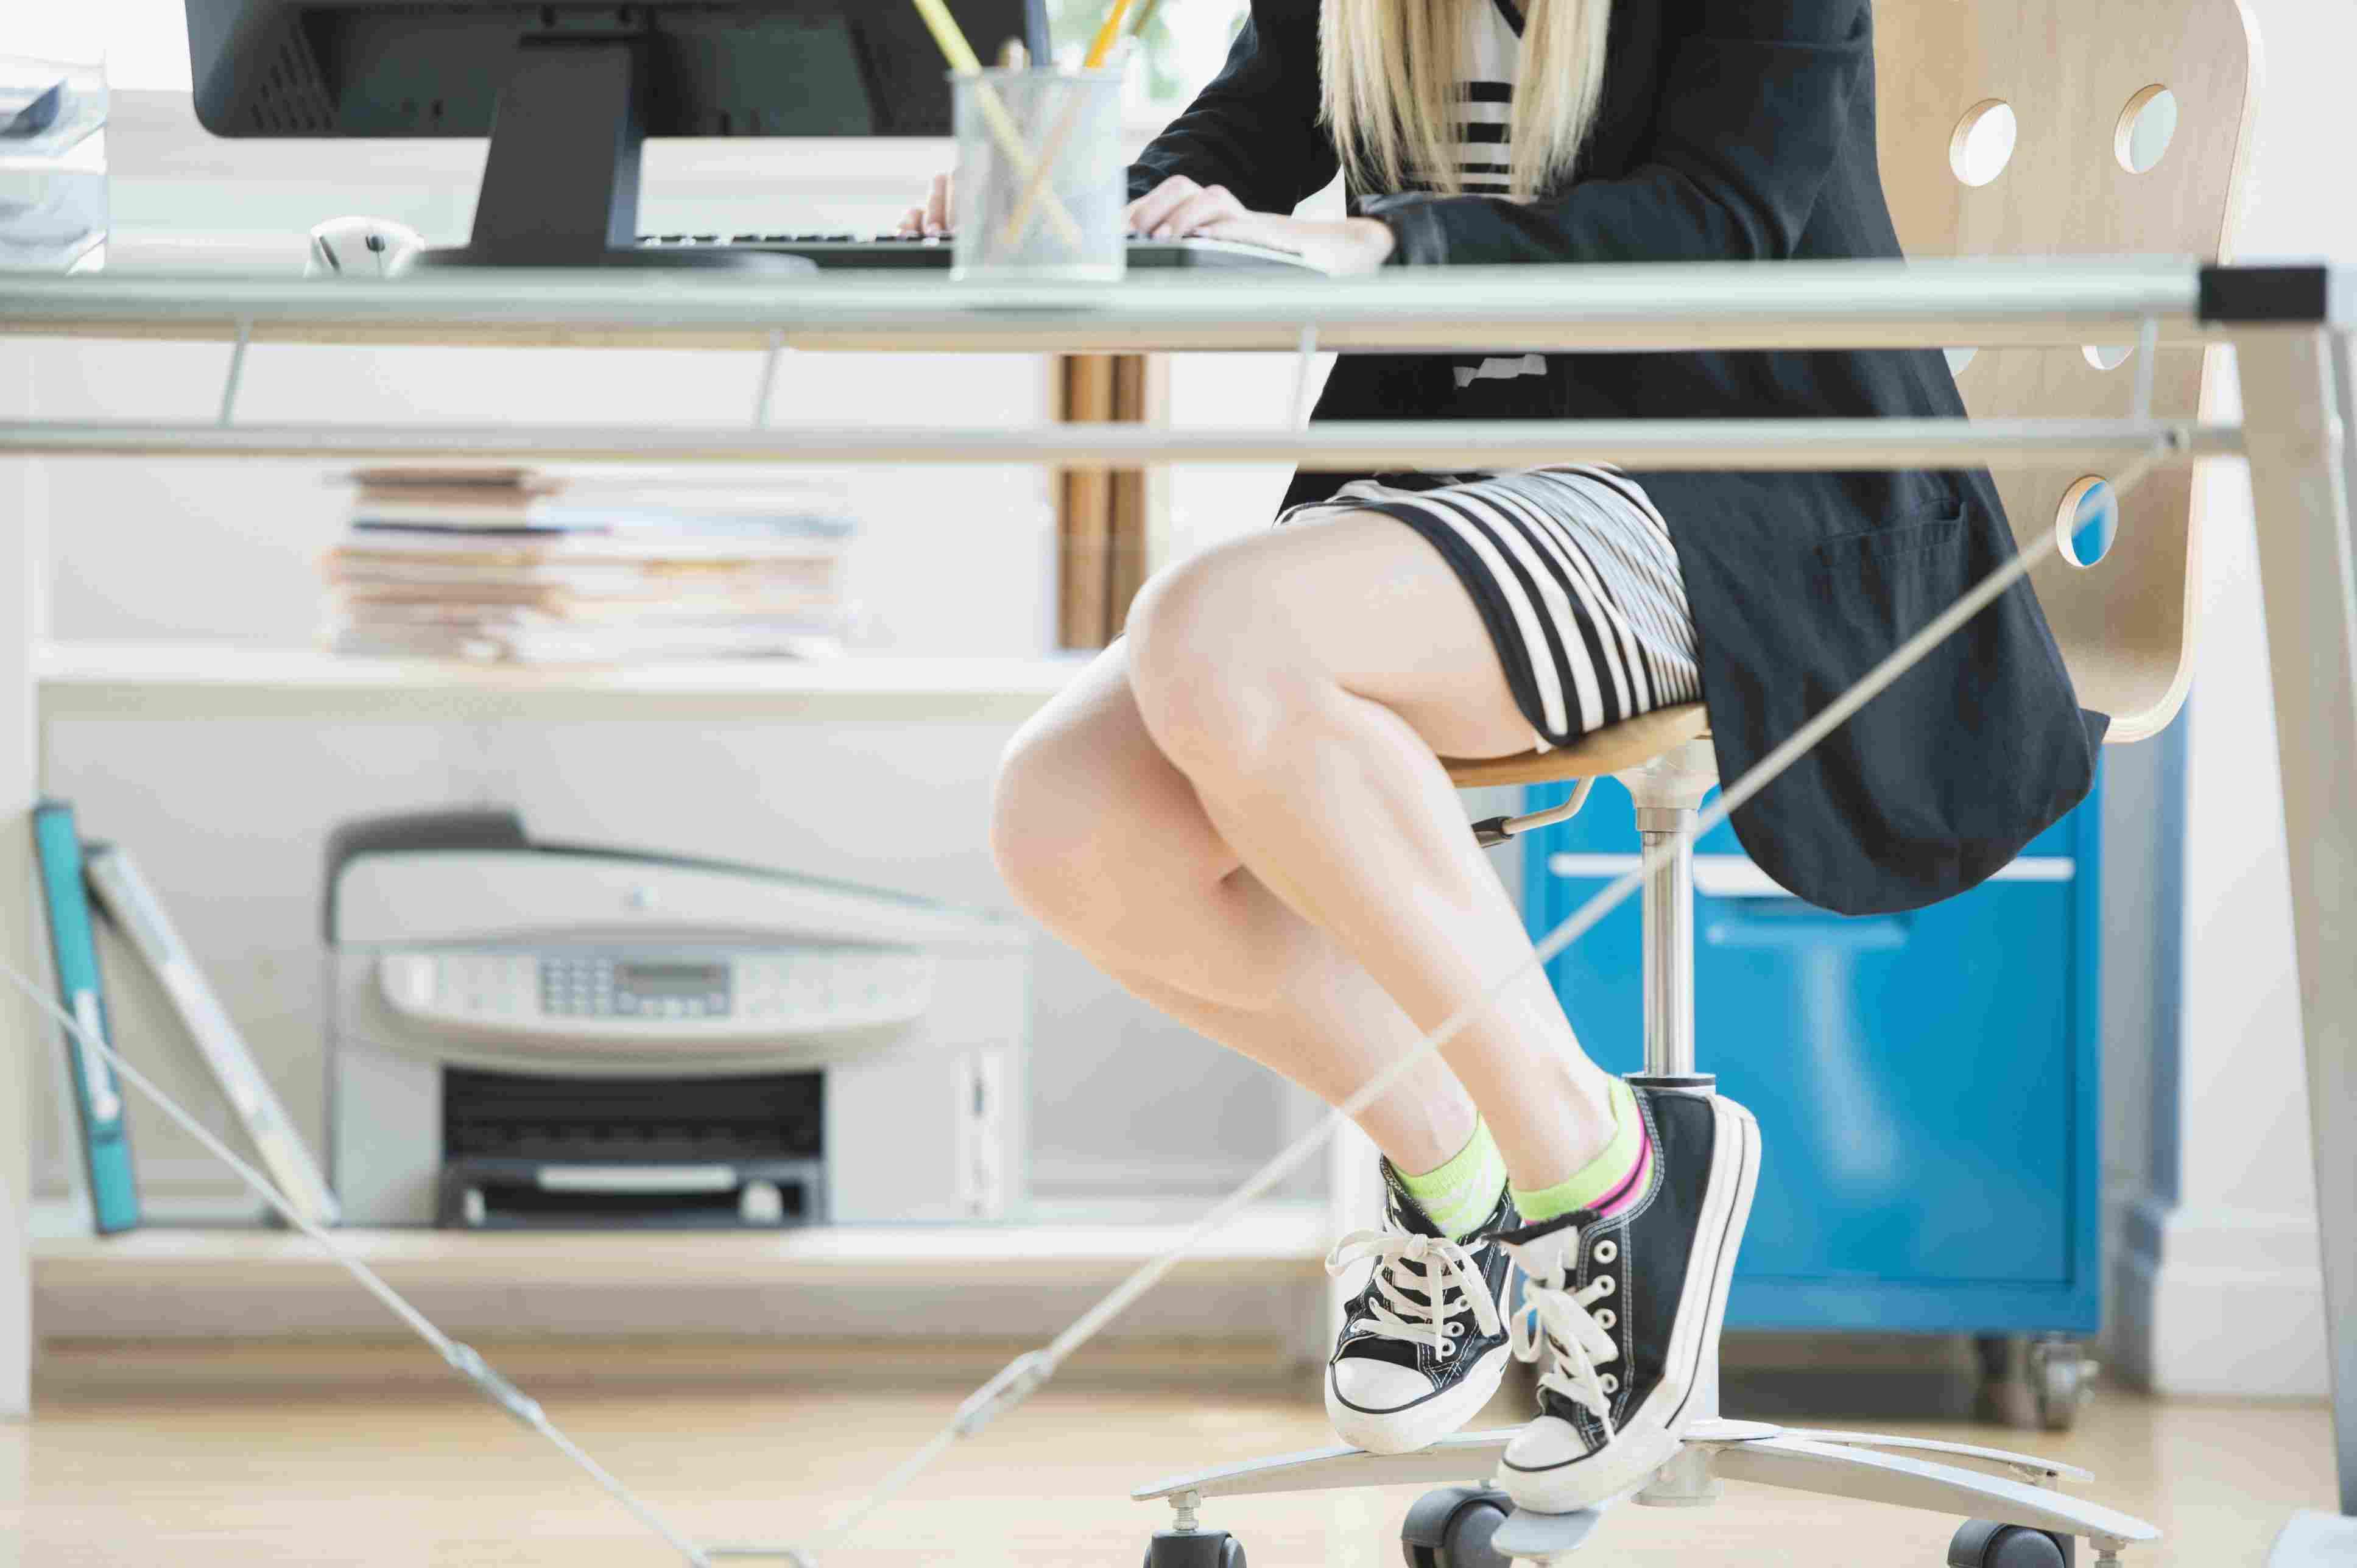 sitting desk wearing athletic shoes Jamie Grill Tetra images Getty 56a9db5f5f9b58b7d0ff8f16